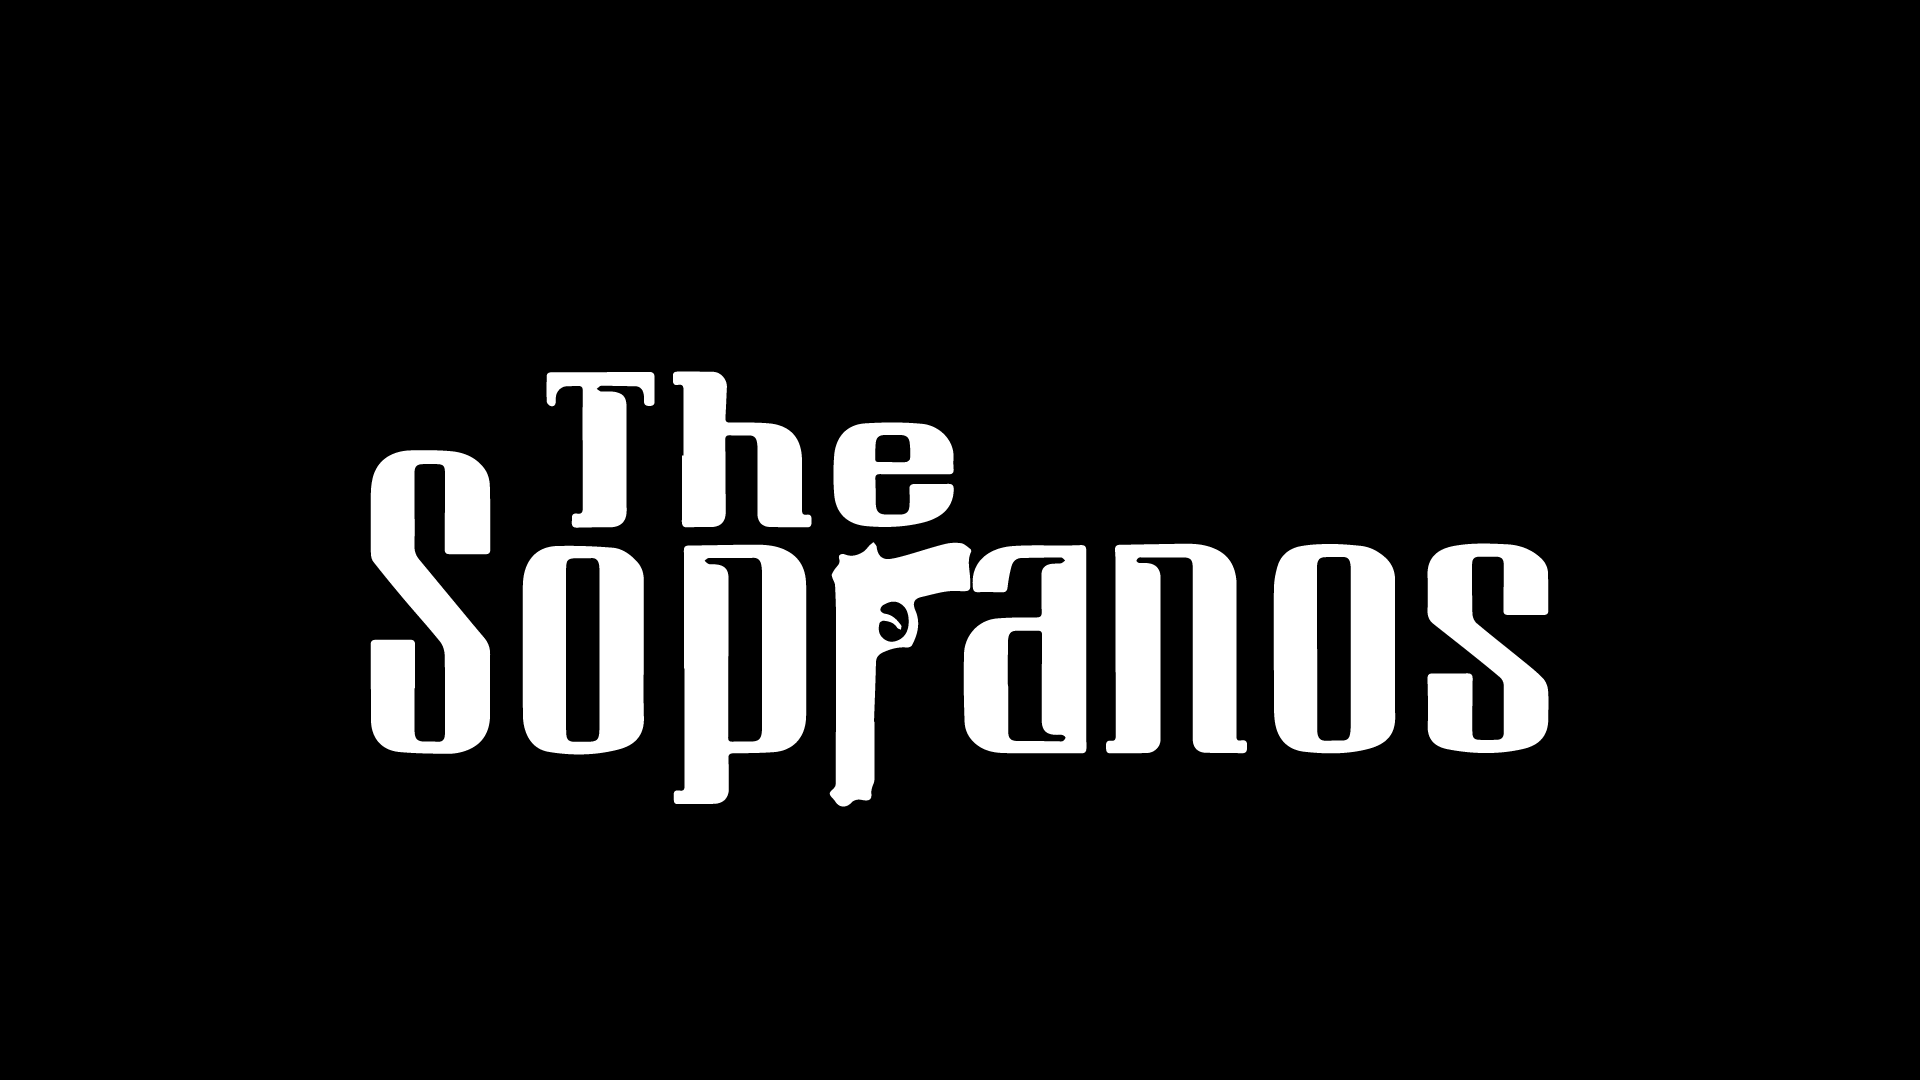 File:Sopranos title.png